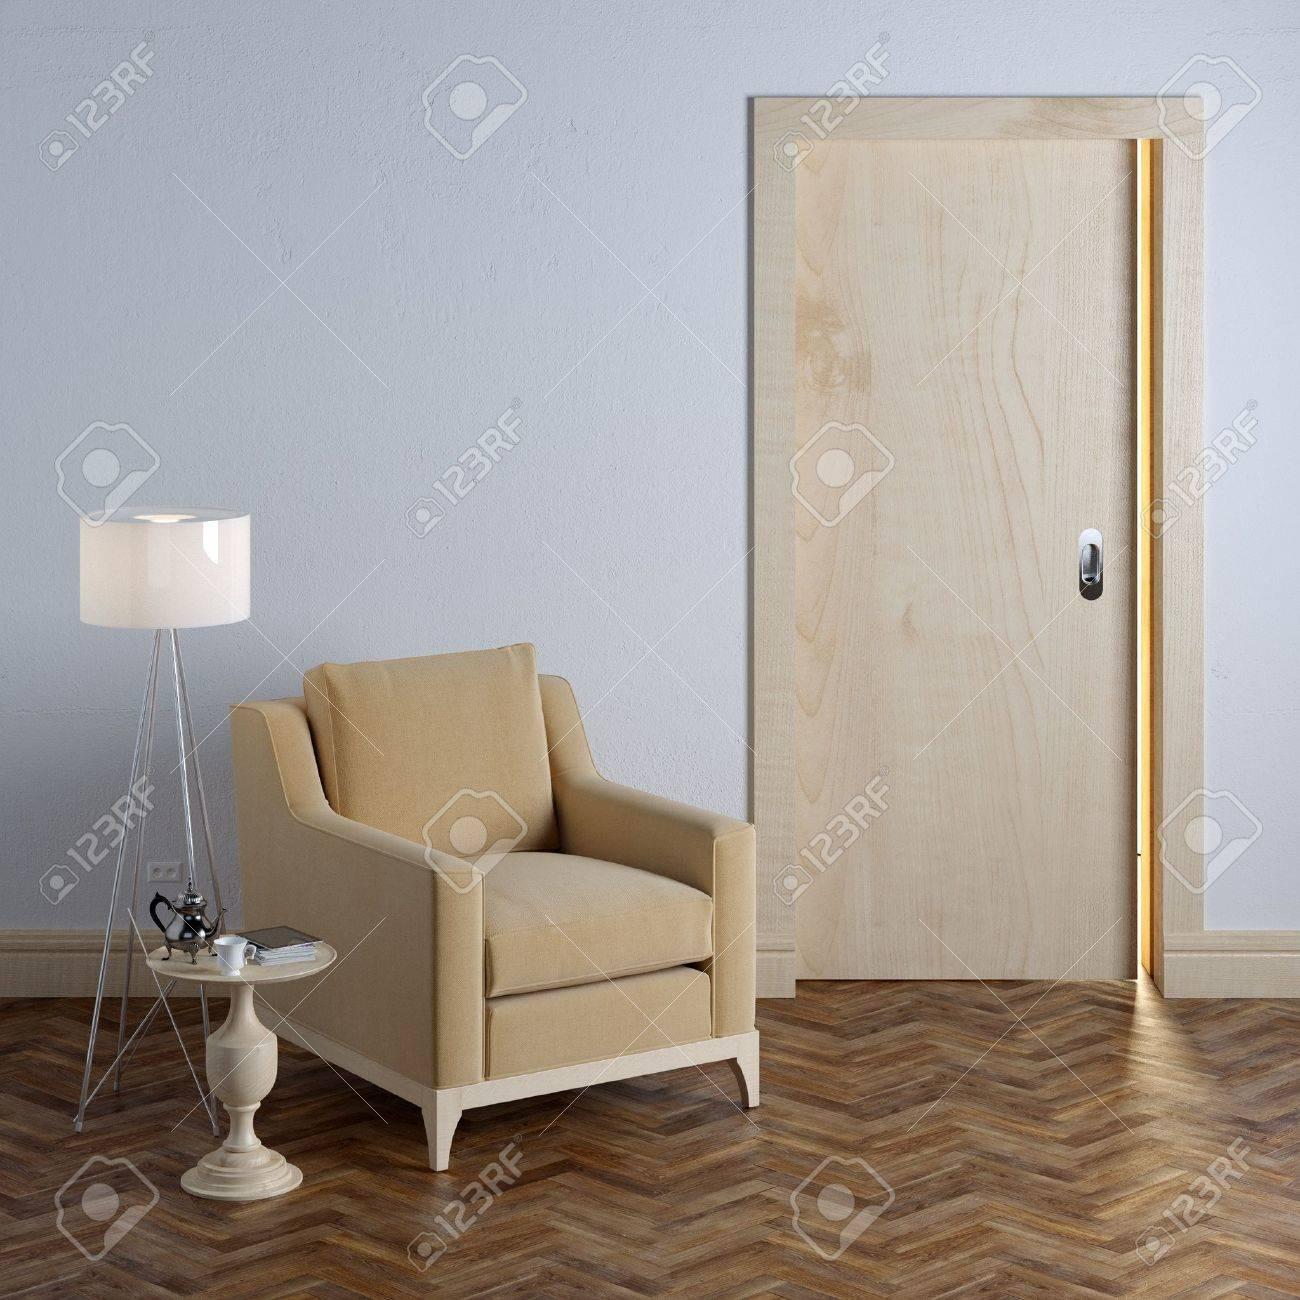 New empty room with beige armchair in classic interior design - 35889698